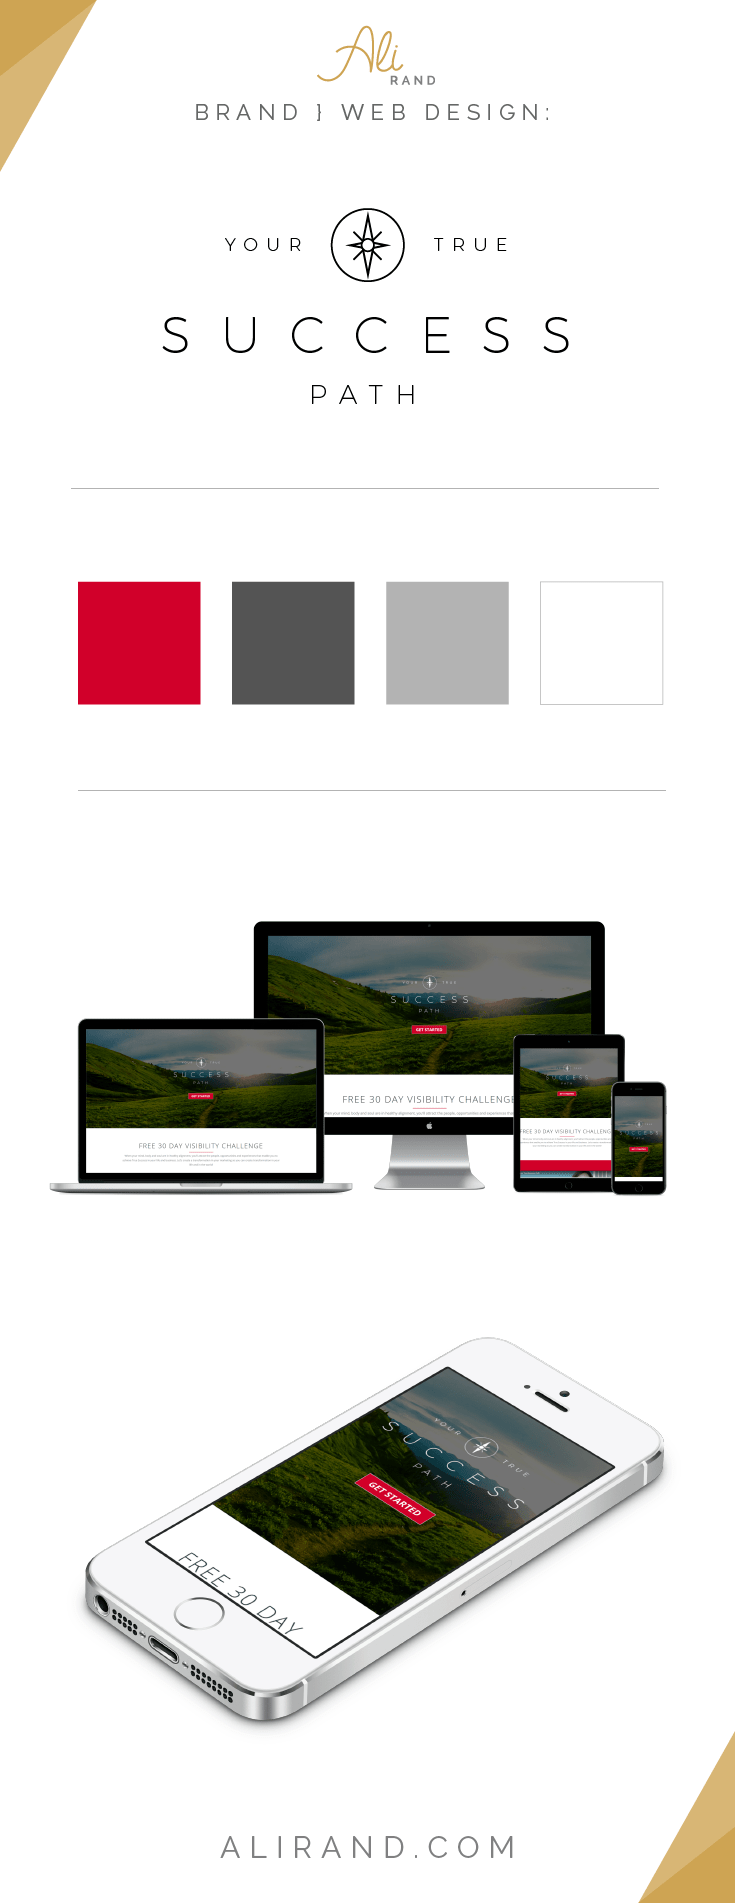 Ali Rand Website Design for Your True Success Path